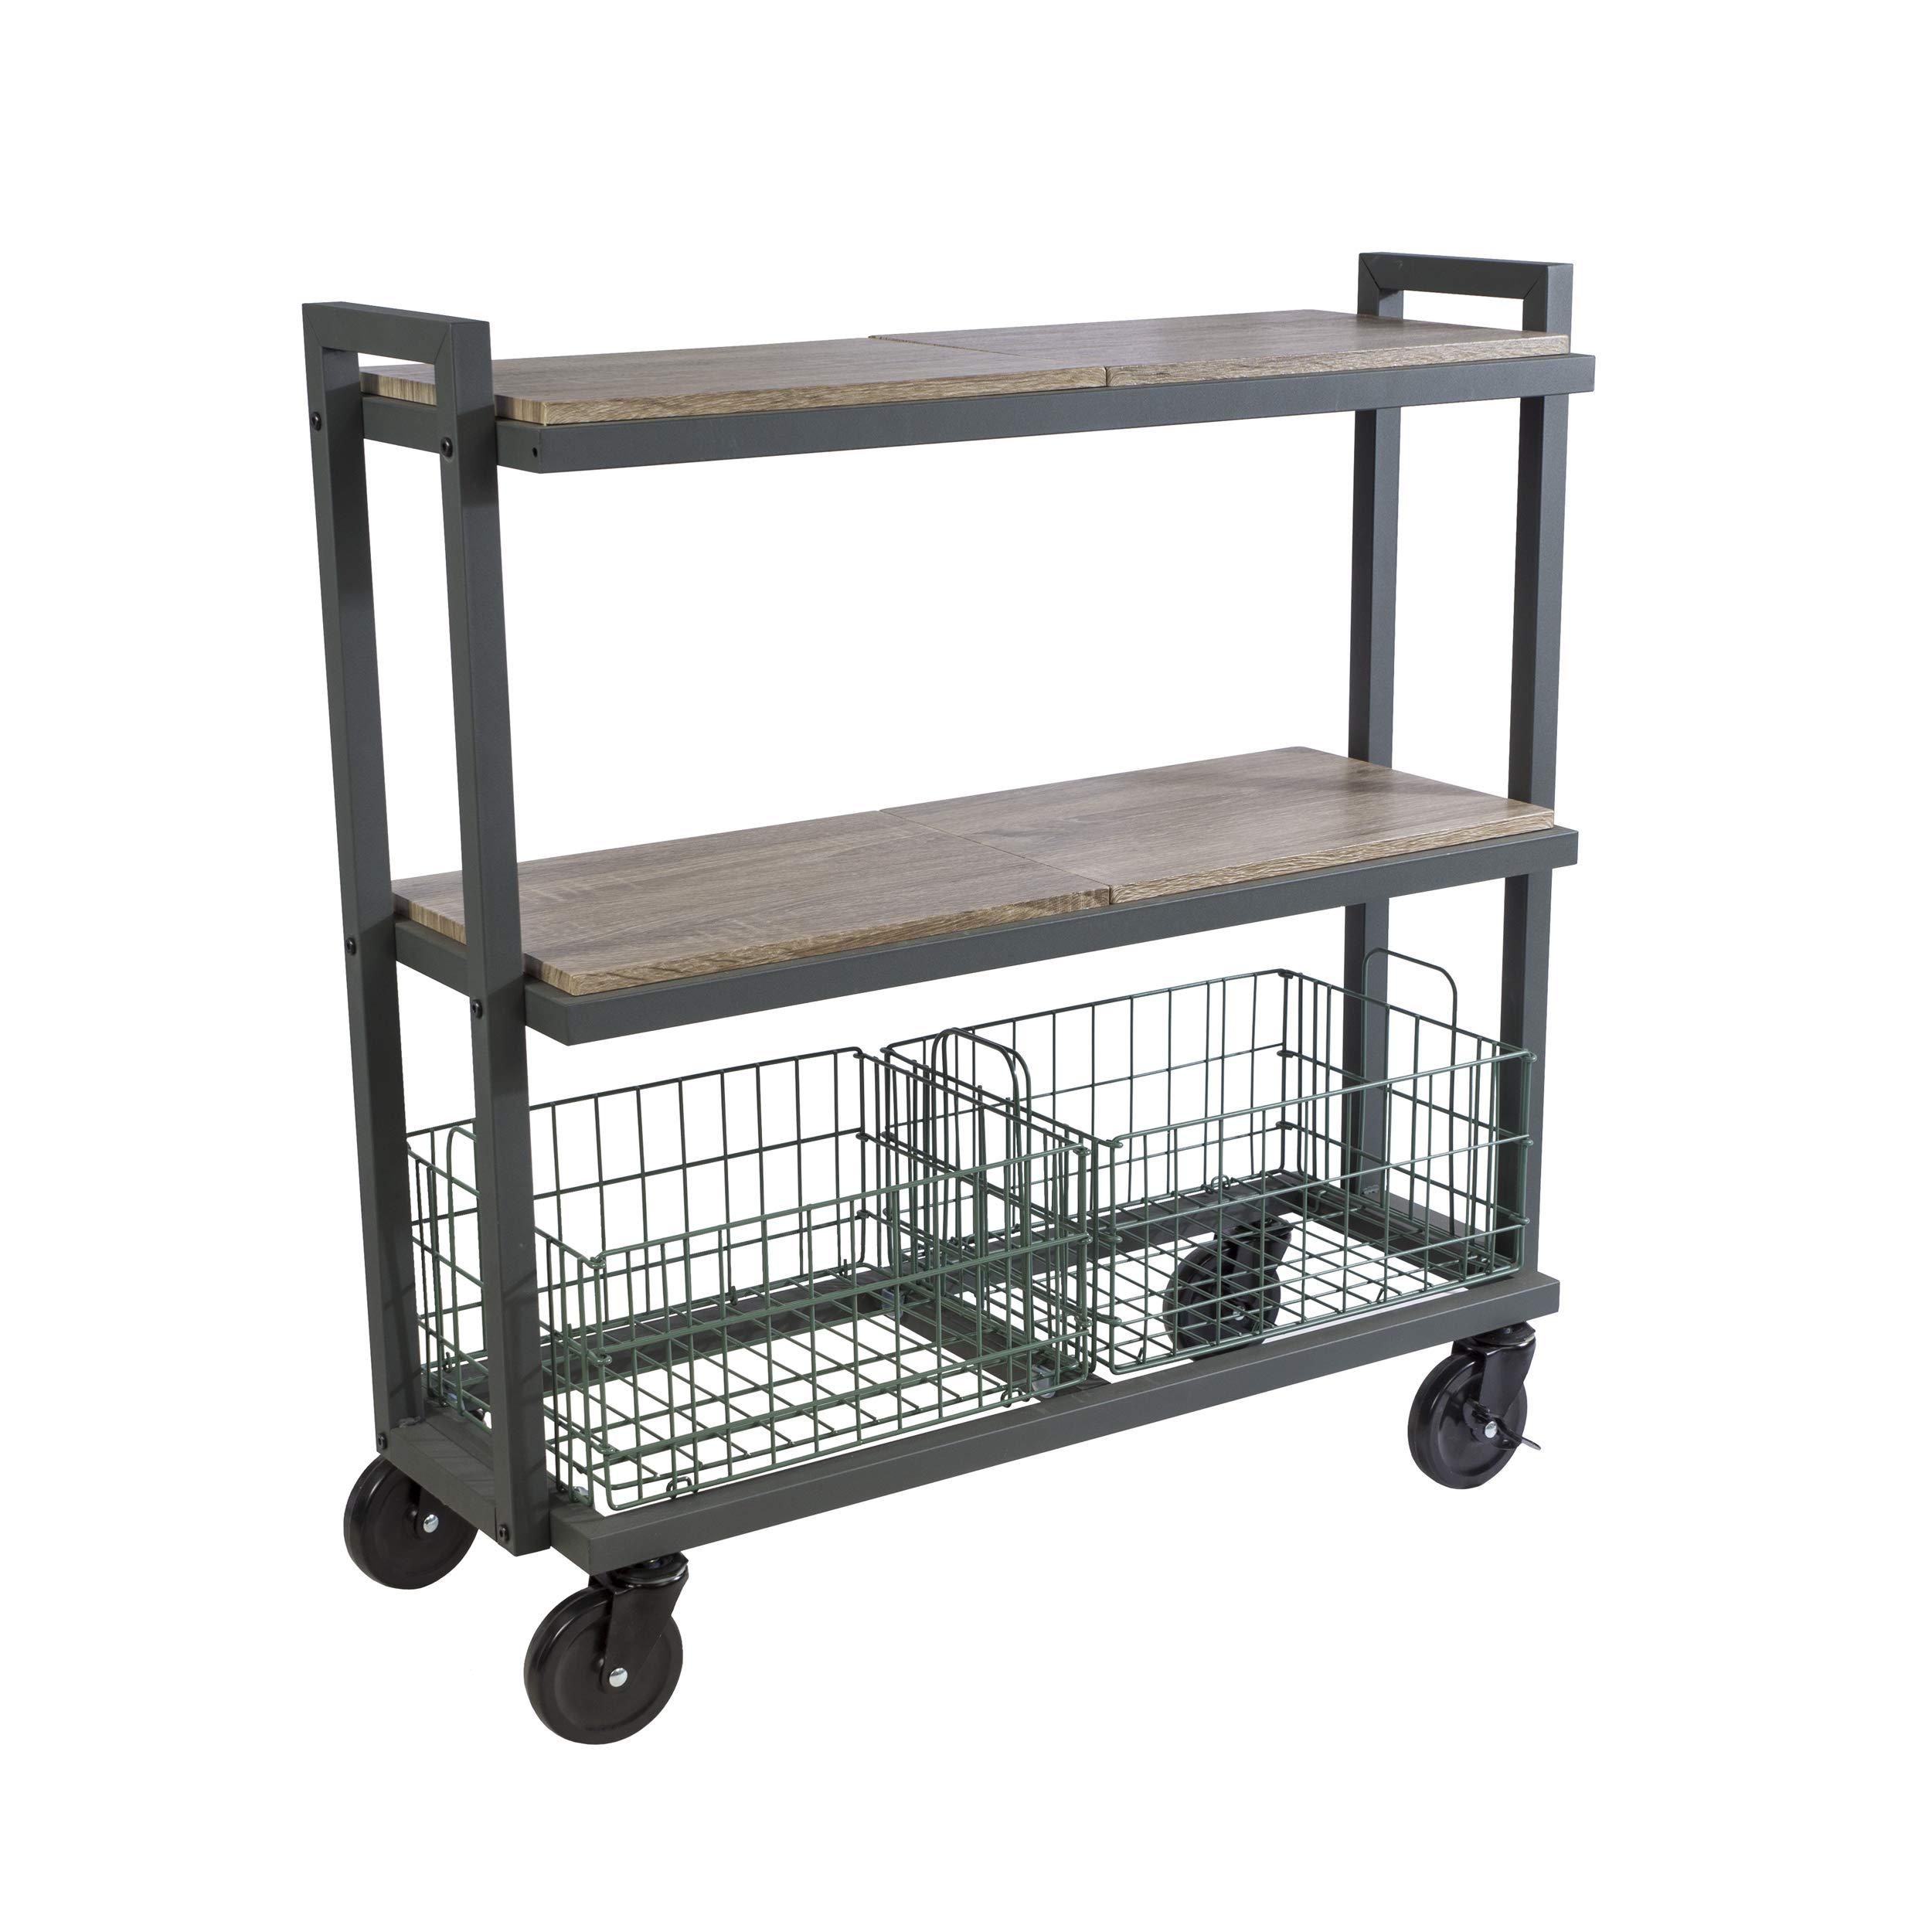 Atlantic System 3 Tier Cart-Wide Mobile Storage Interchange Shelves and Baskets, Powder-Coated Steel Frame PN23350330 in Kale Green by Atlantic